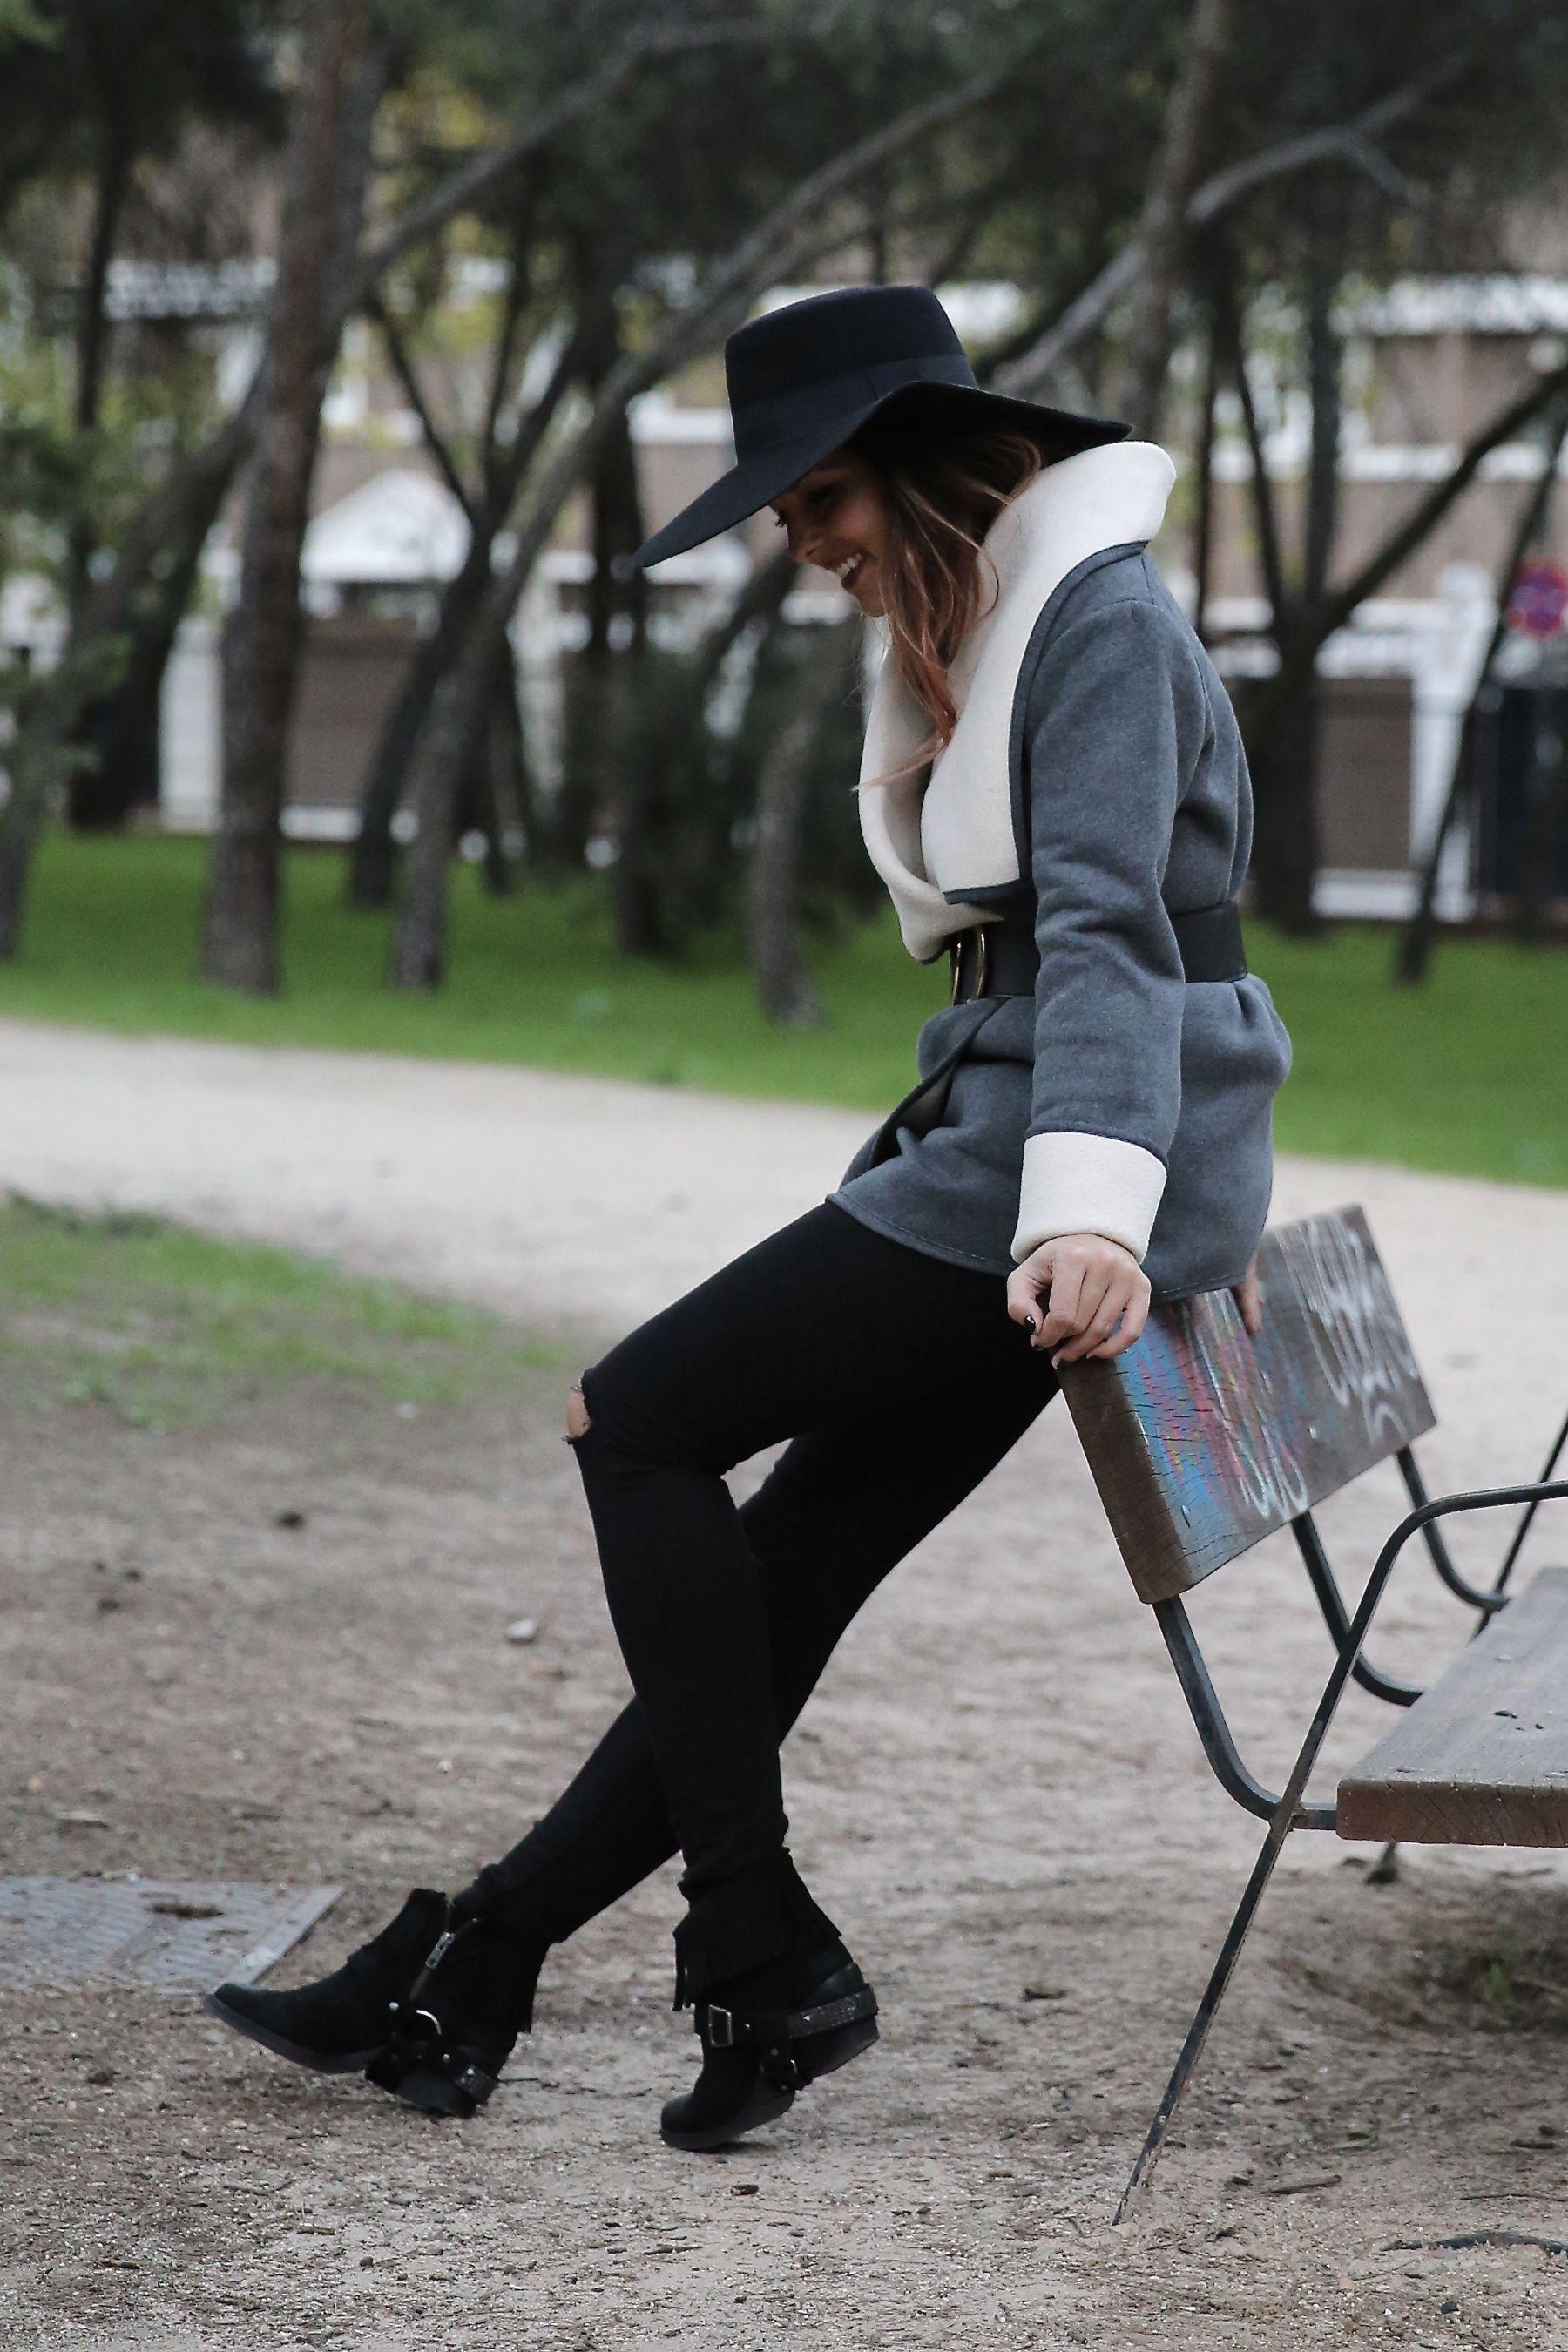 trendy_taste-look-outfit-street_style-ootd-blog-blogger-fashion_spain-moda_españa-abrigo_borrego-borreguillo-otoño-frio-cold-hat-sombrero-boho-hippie-steve_madden-skinny_jeans-pitillos-fall-6